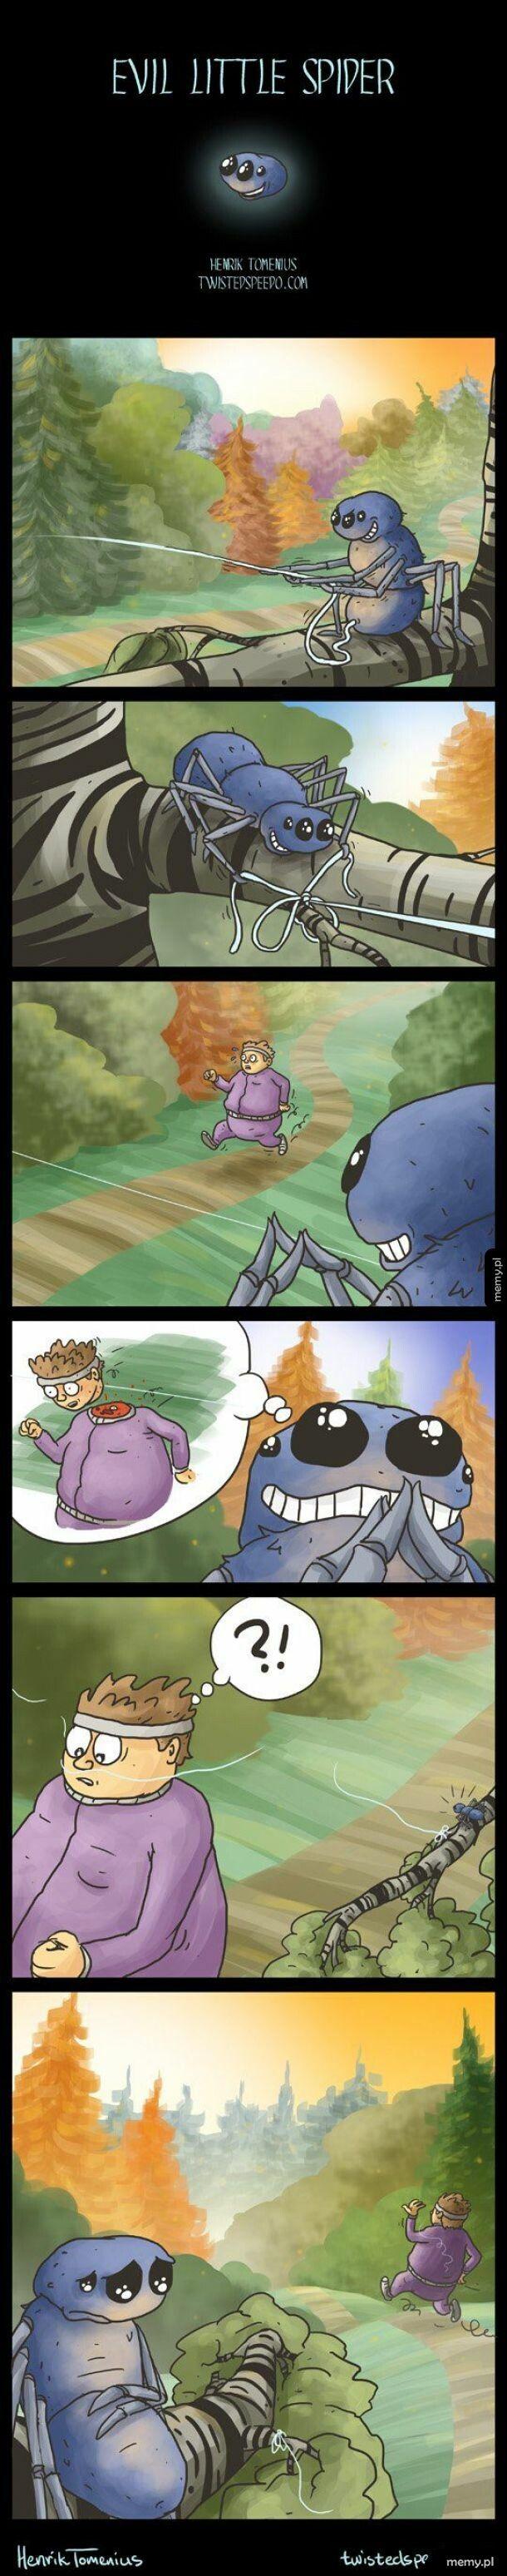 Evil Little Spider